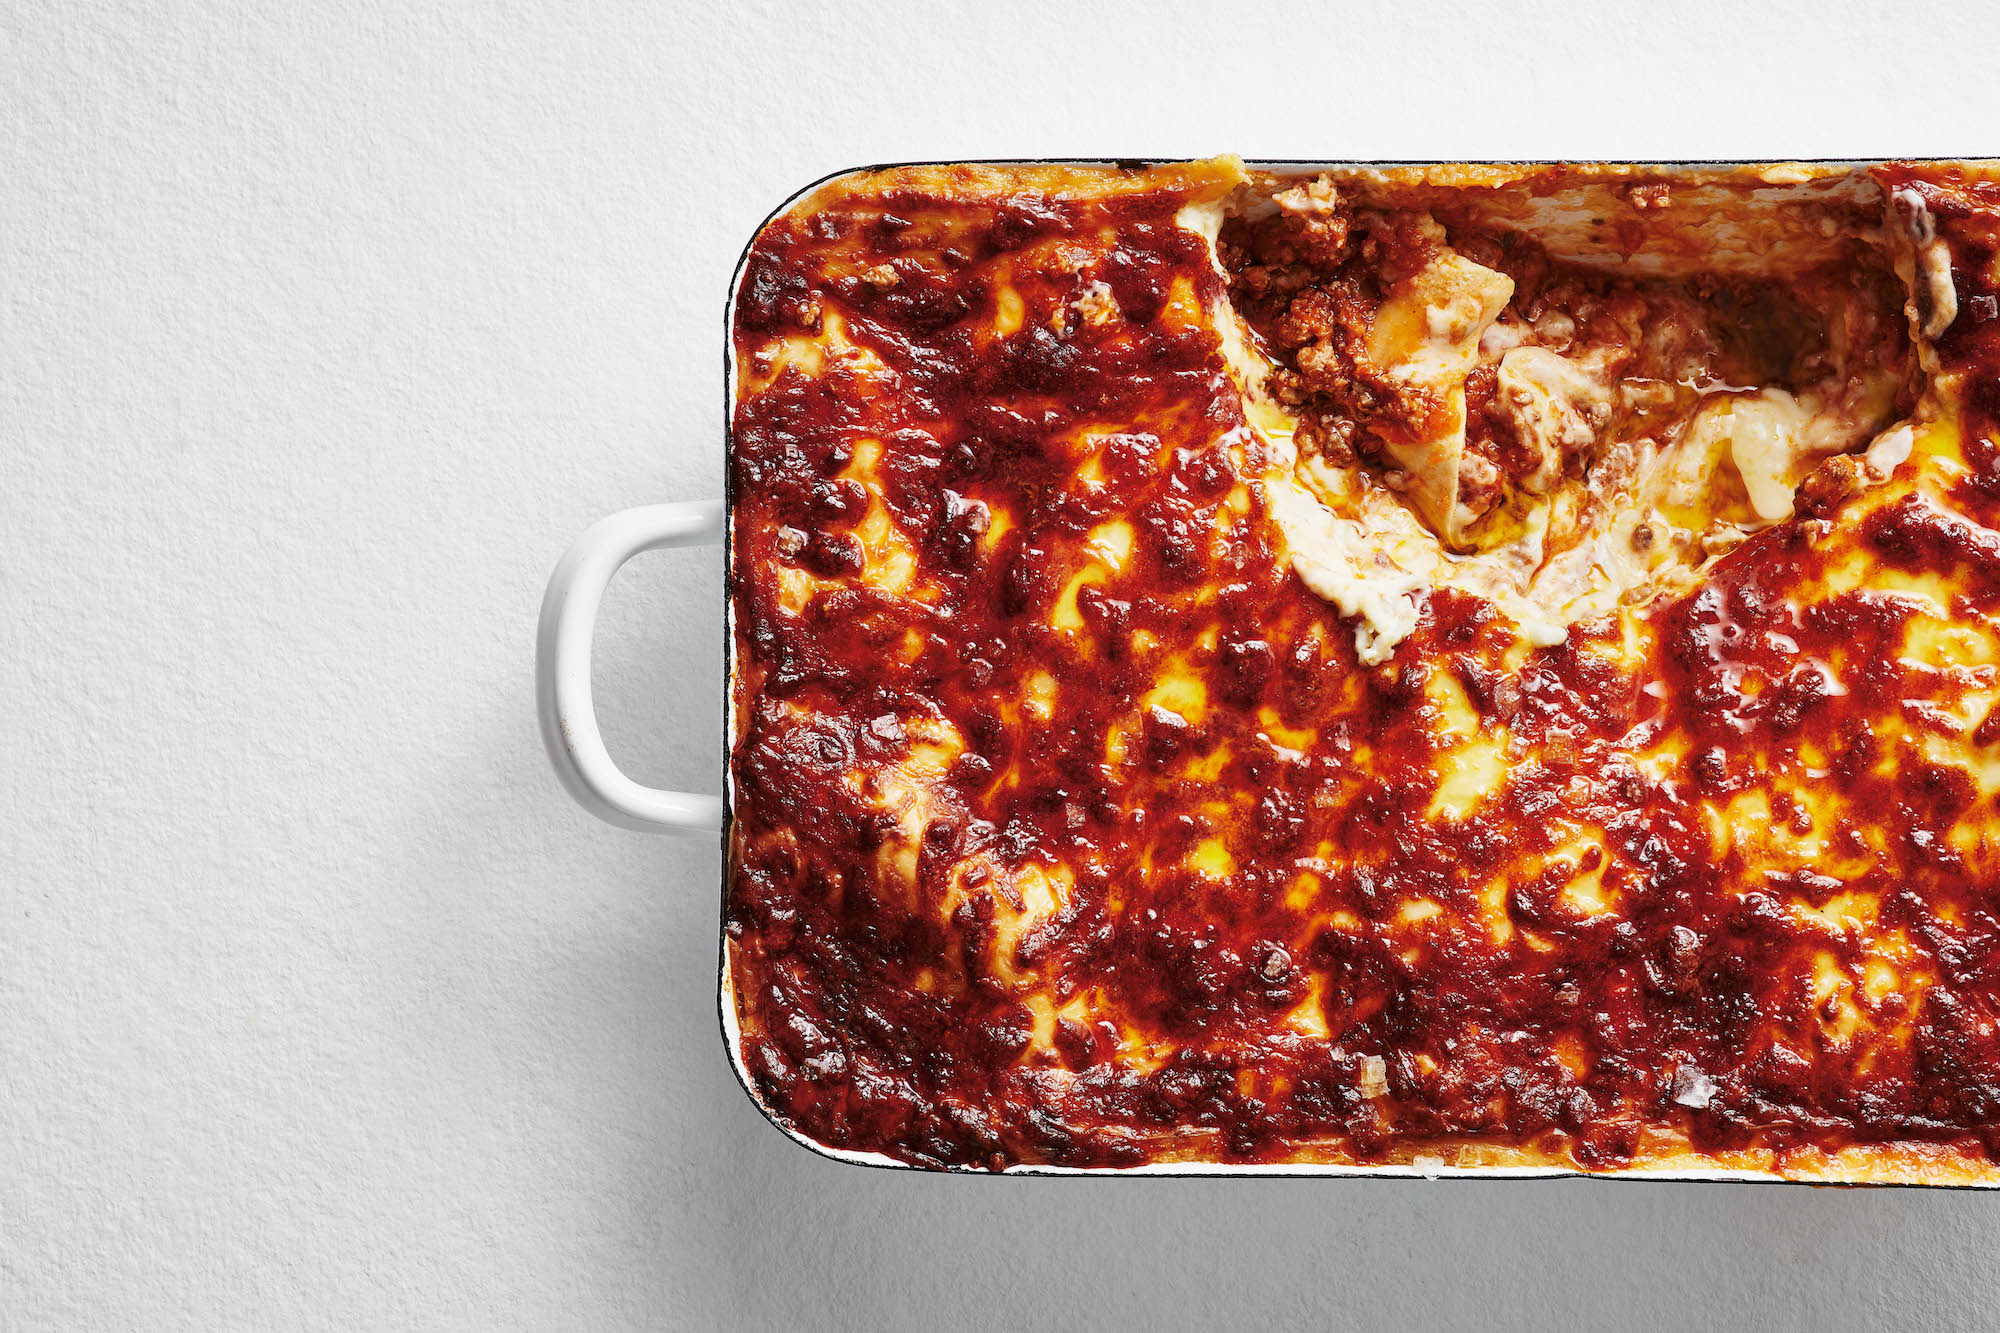 A dish of lasagna